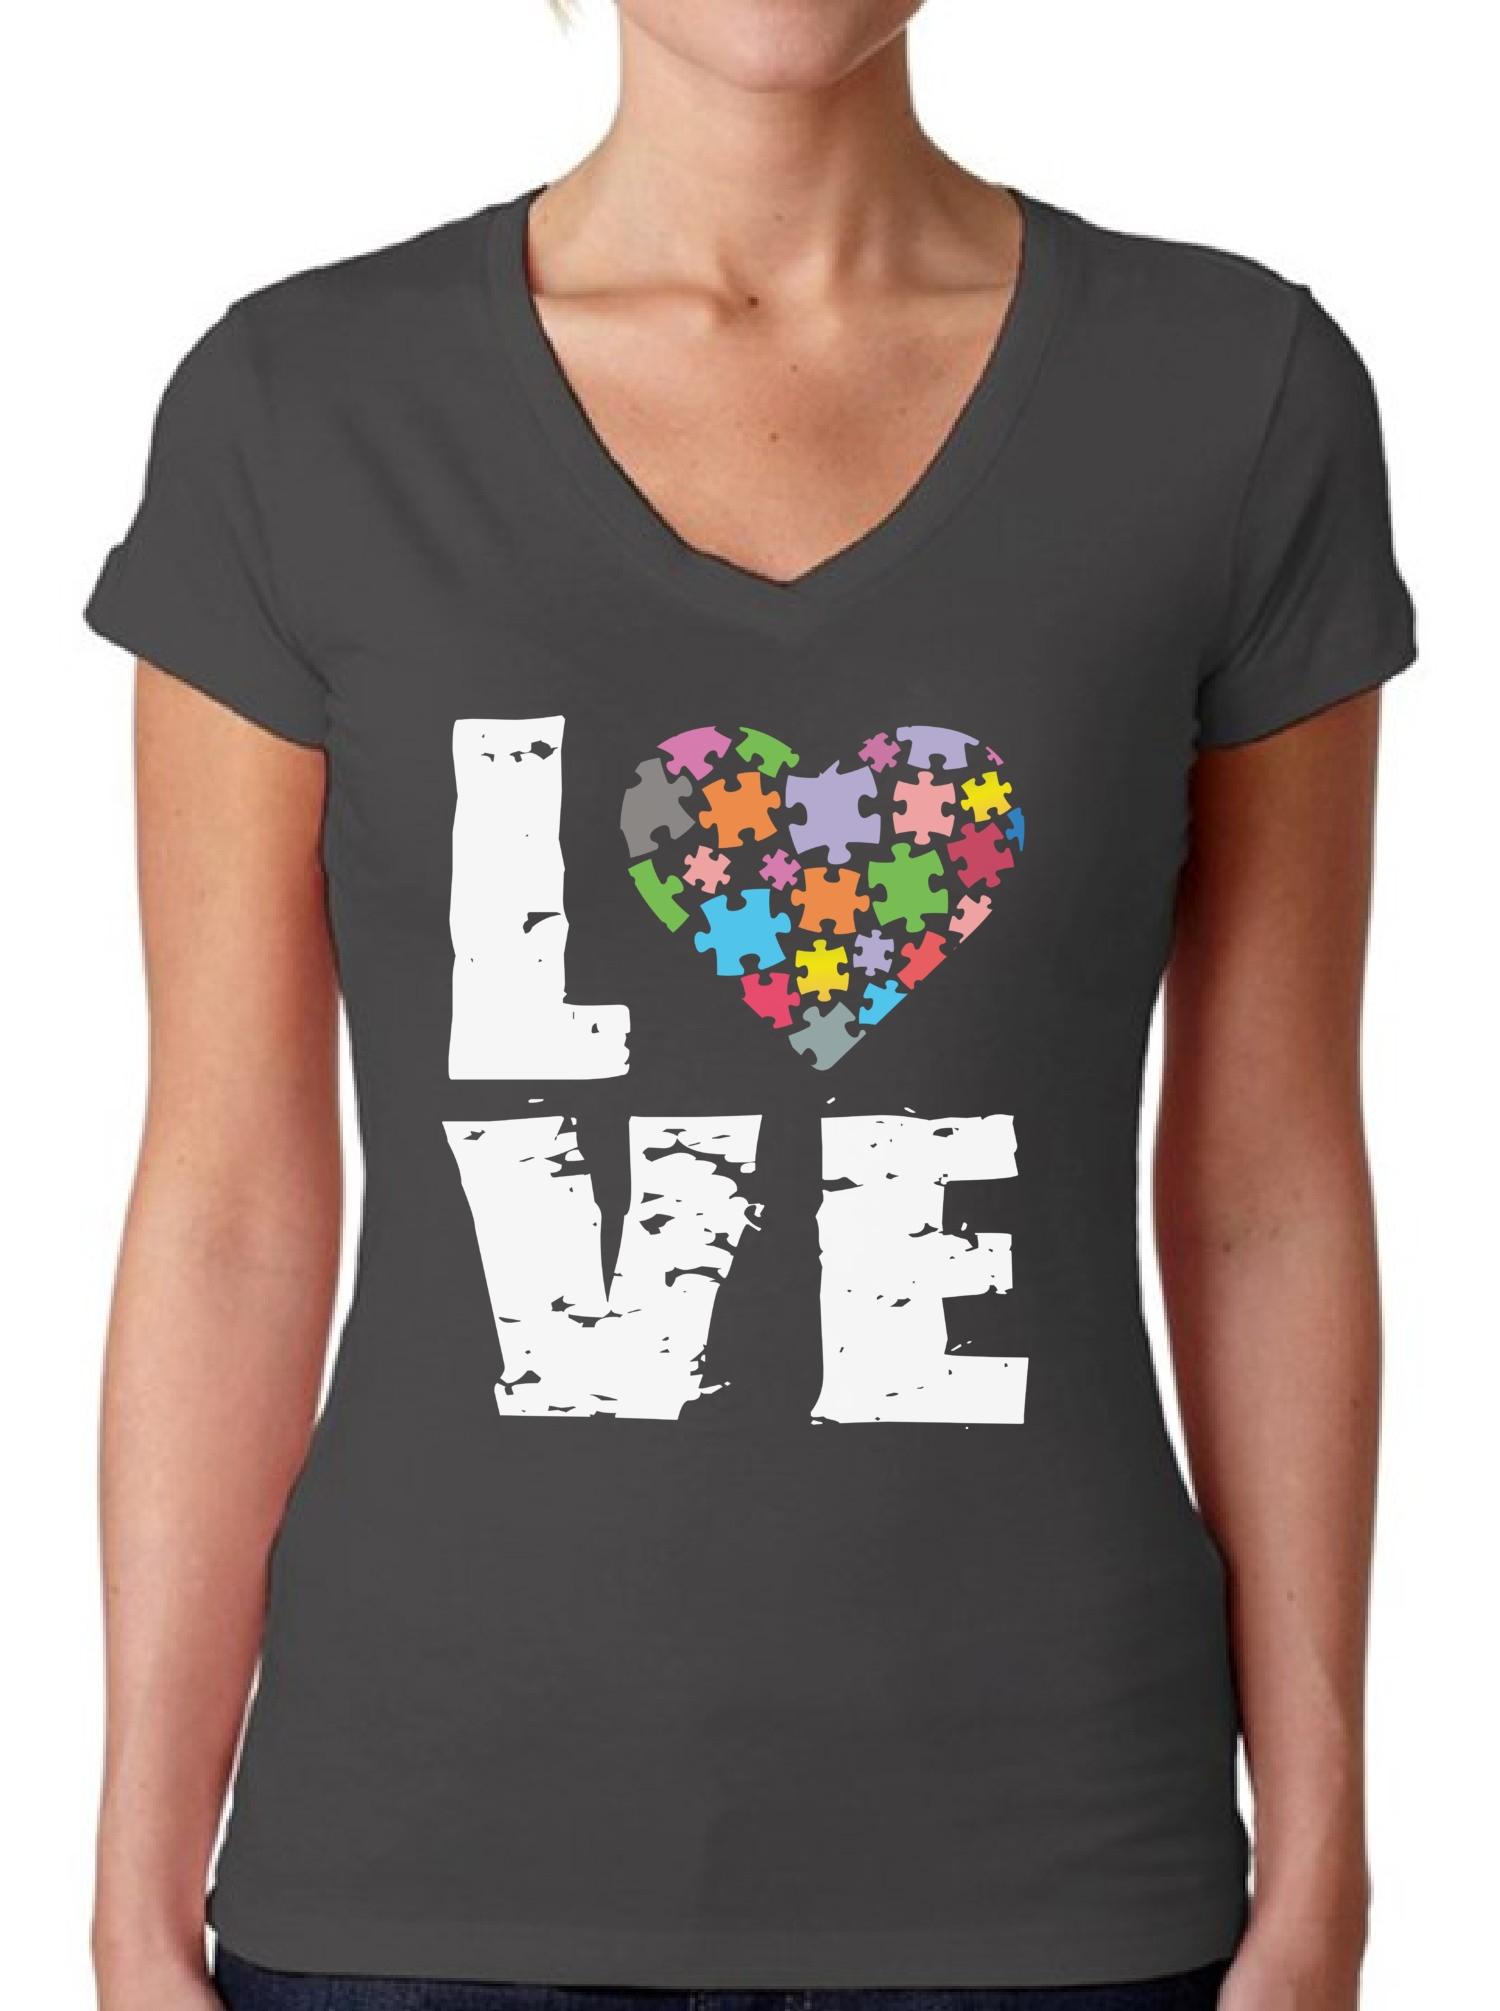 Autism Awareness V Neck T Shirts Shirts Tops Women 39 S Love